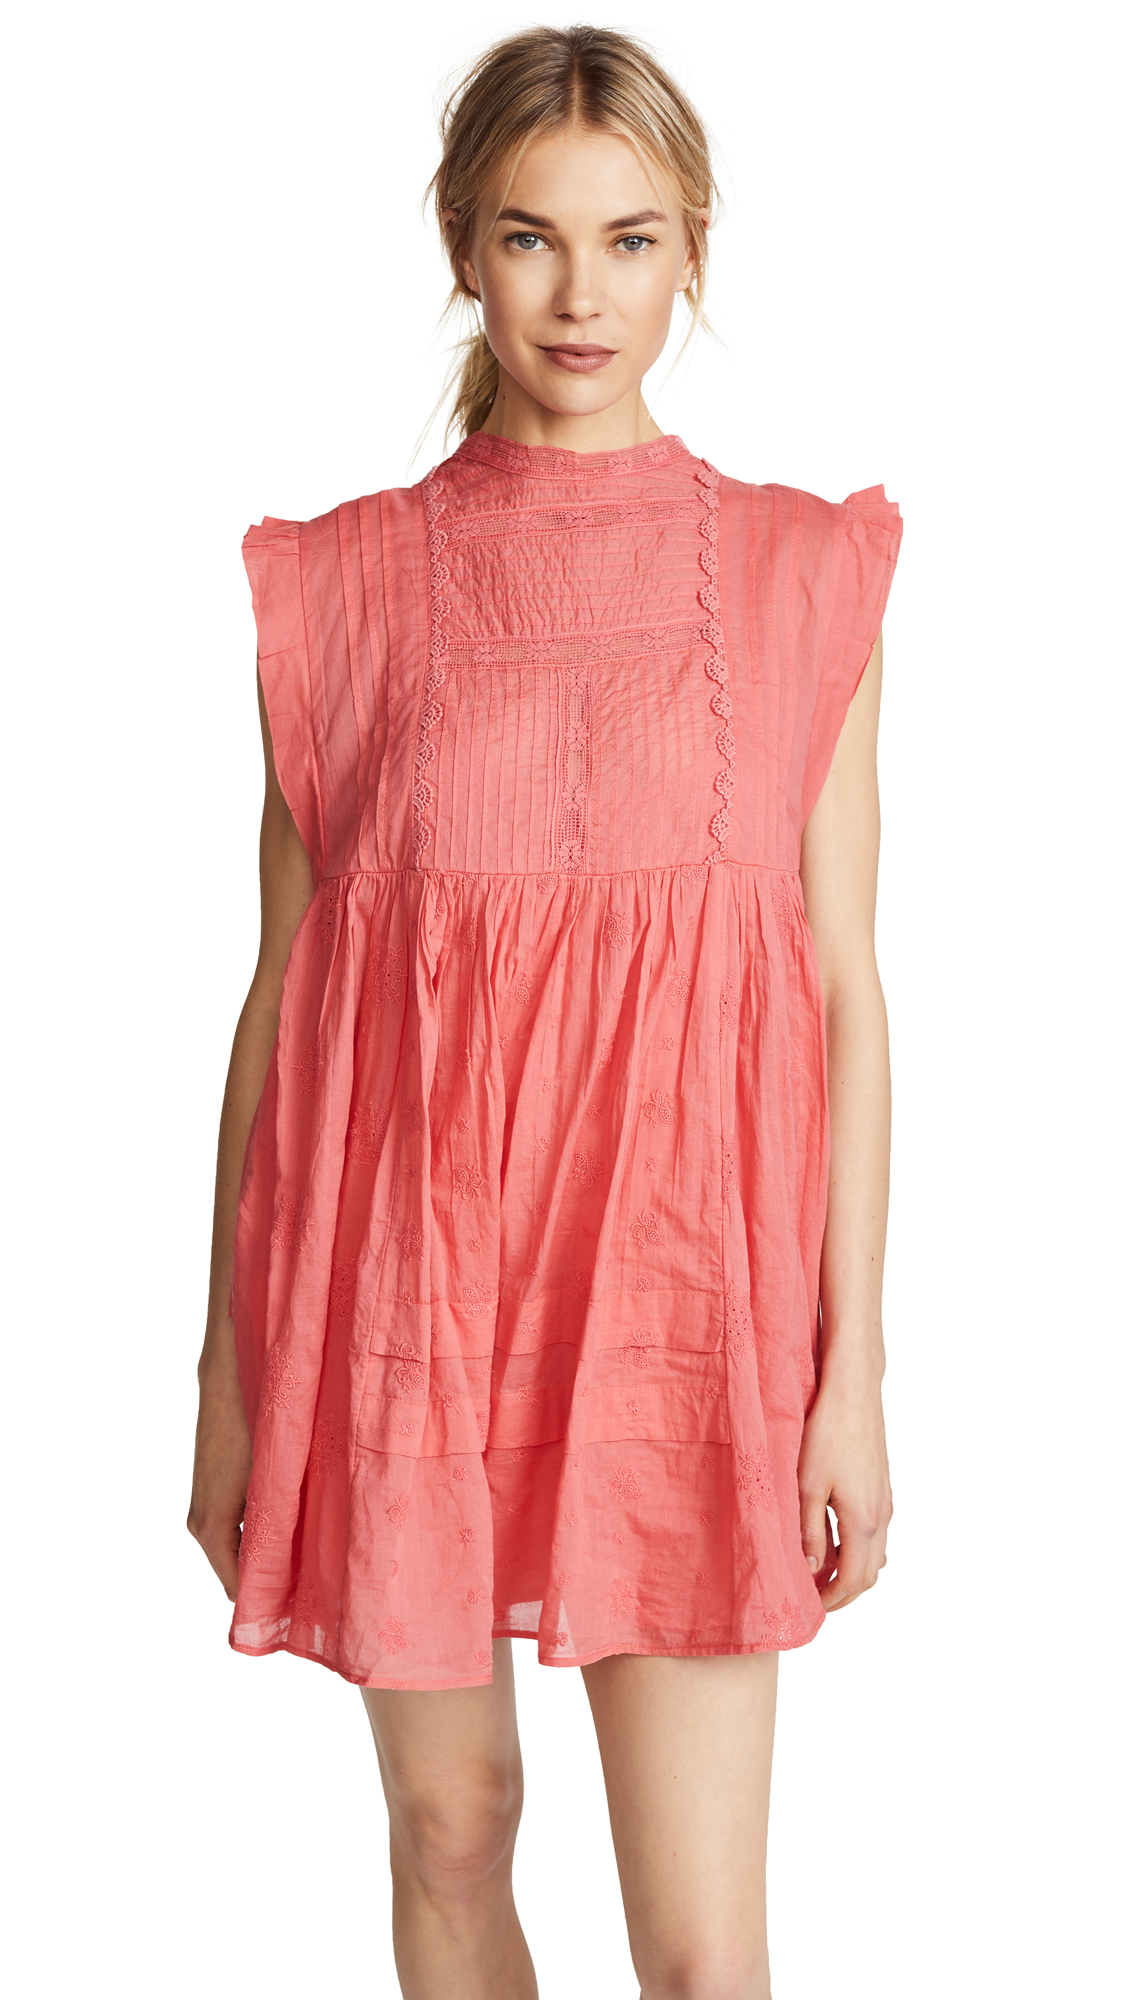 Free People Nobody Like You Embellished Mini Dress - Coral